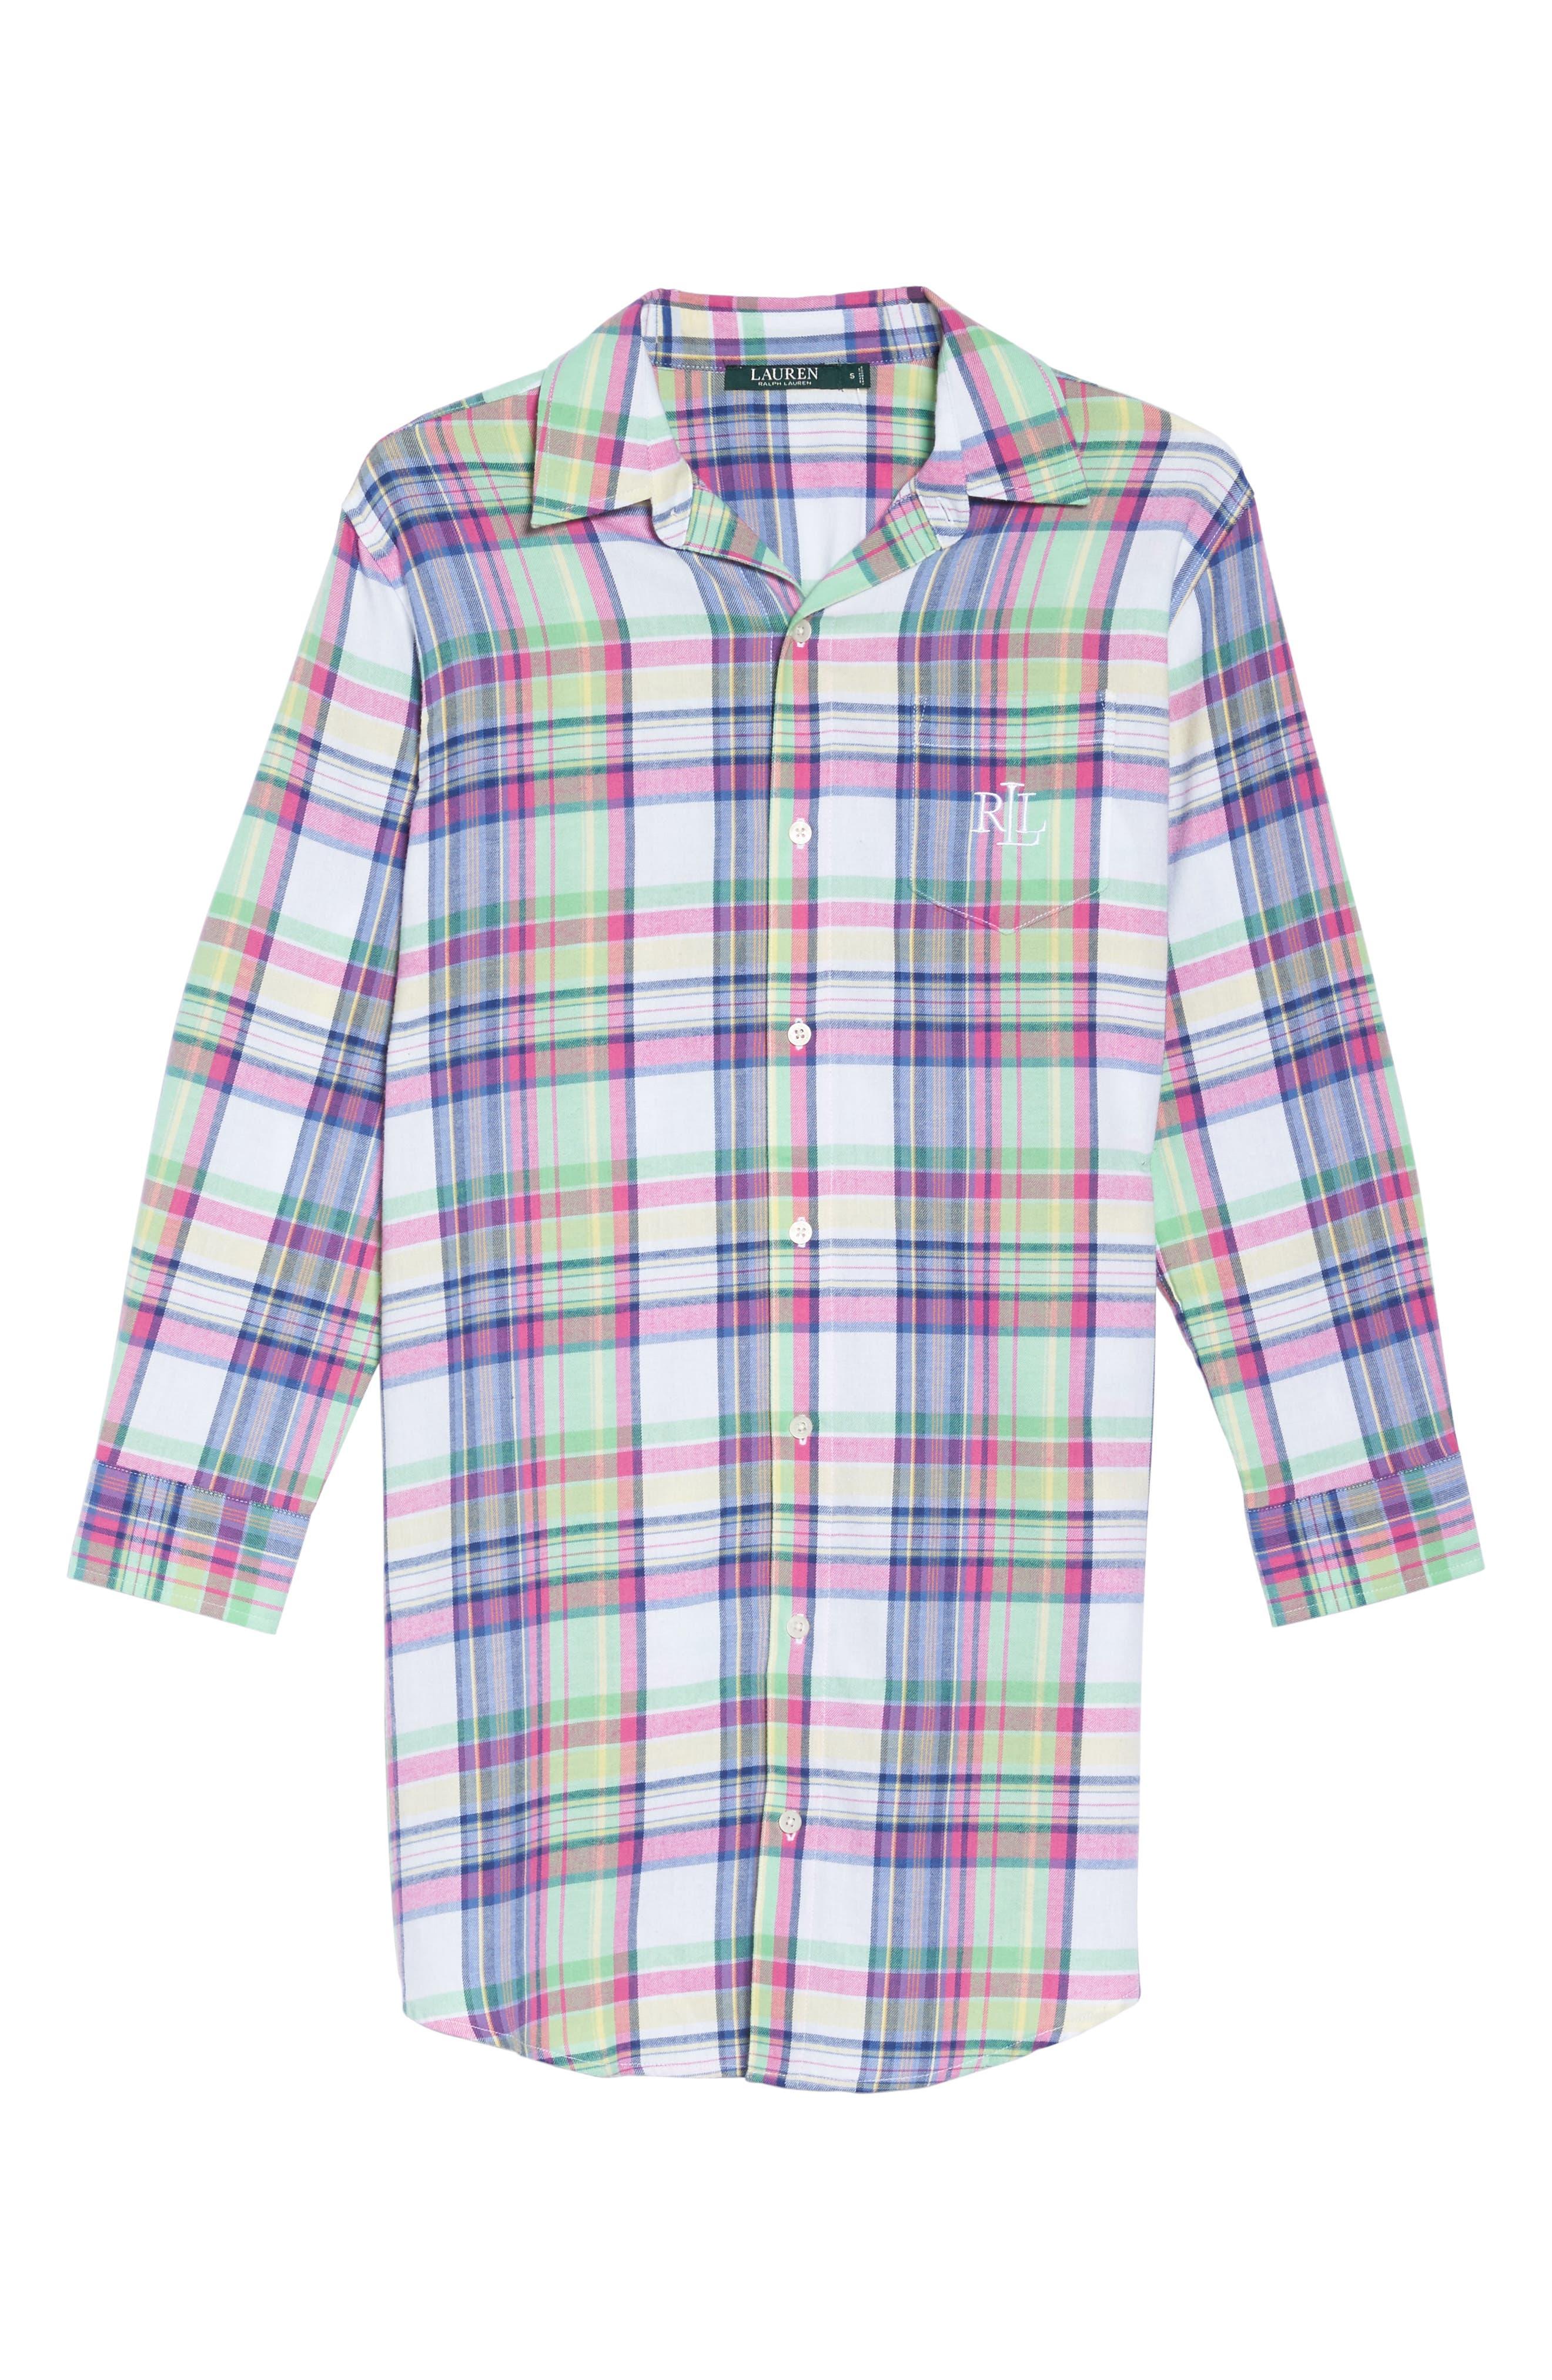 Sleep Shirt,                             Alternate thumbnail 6, color,                             304